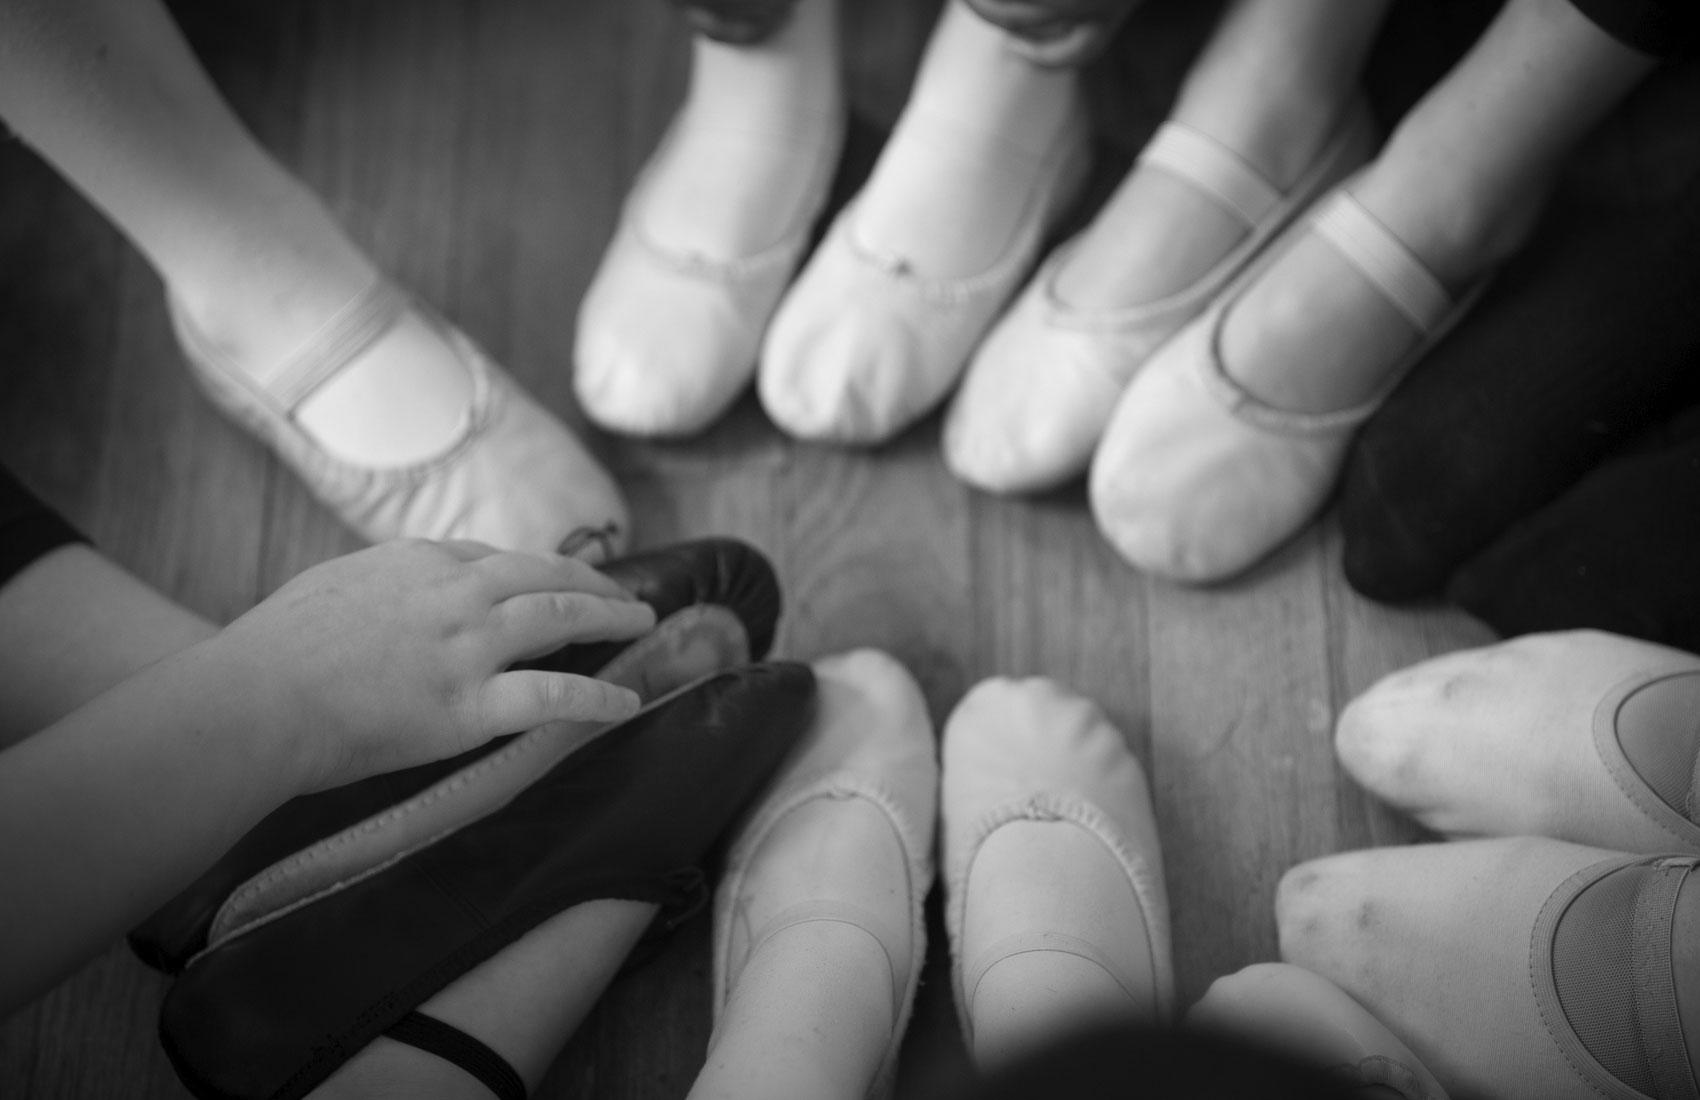 Dancers' feet in a circle